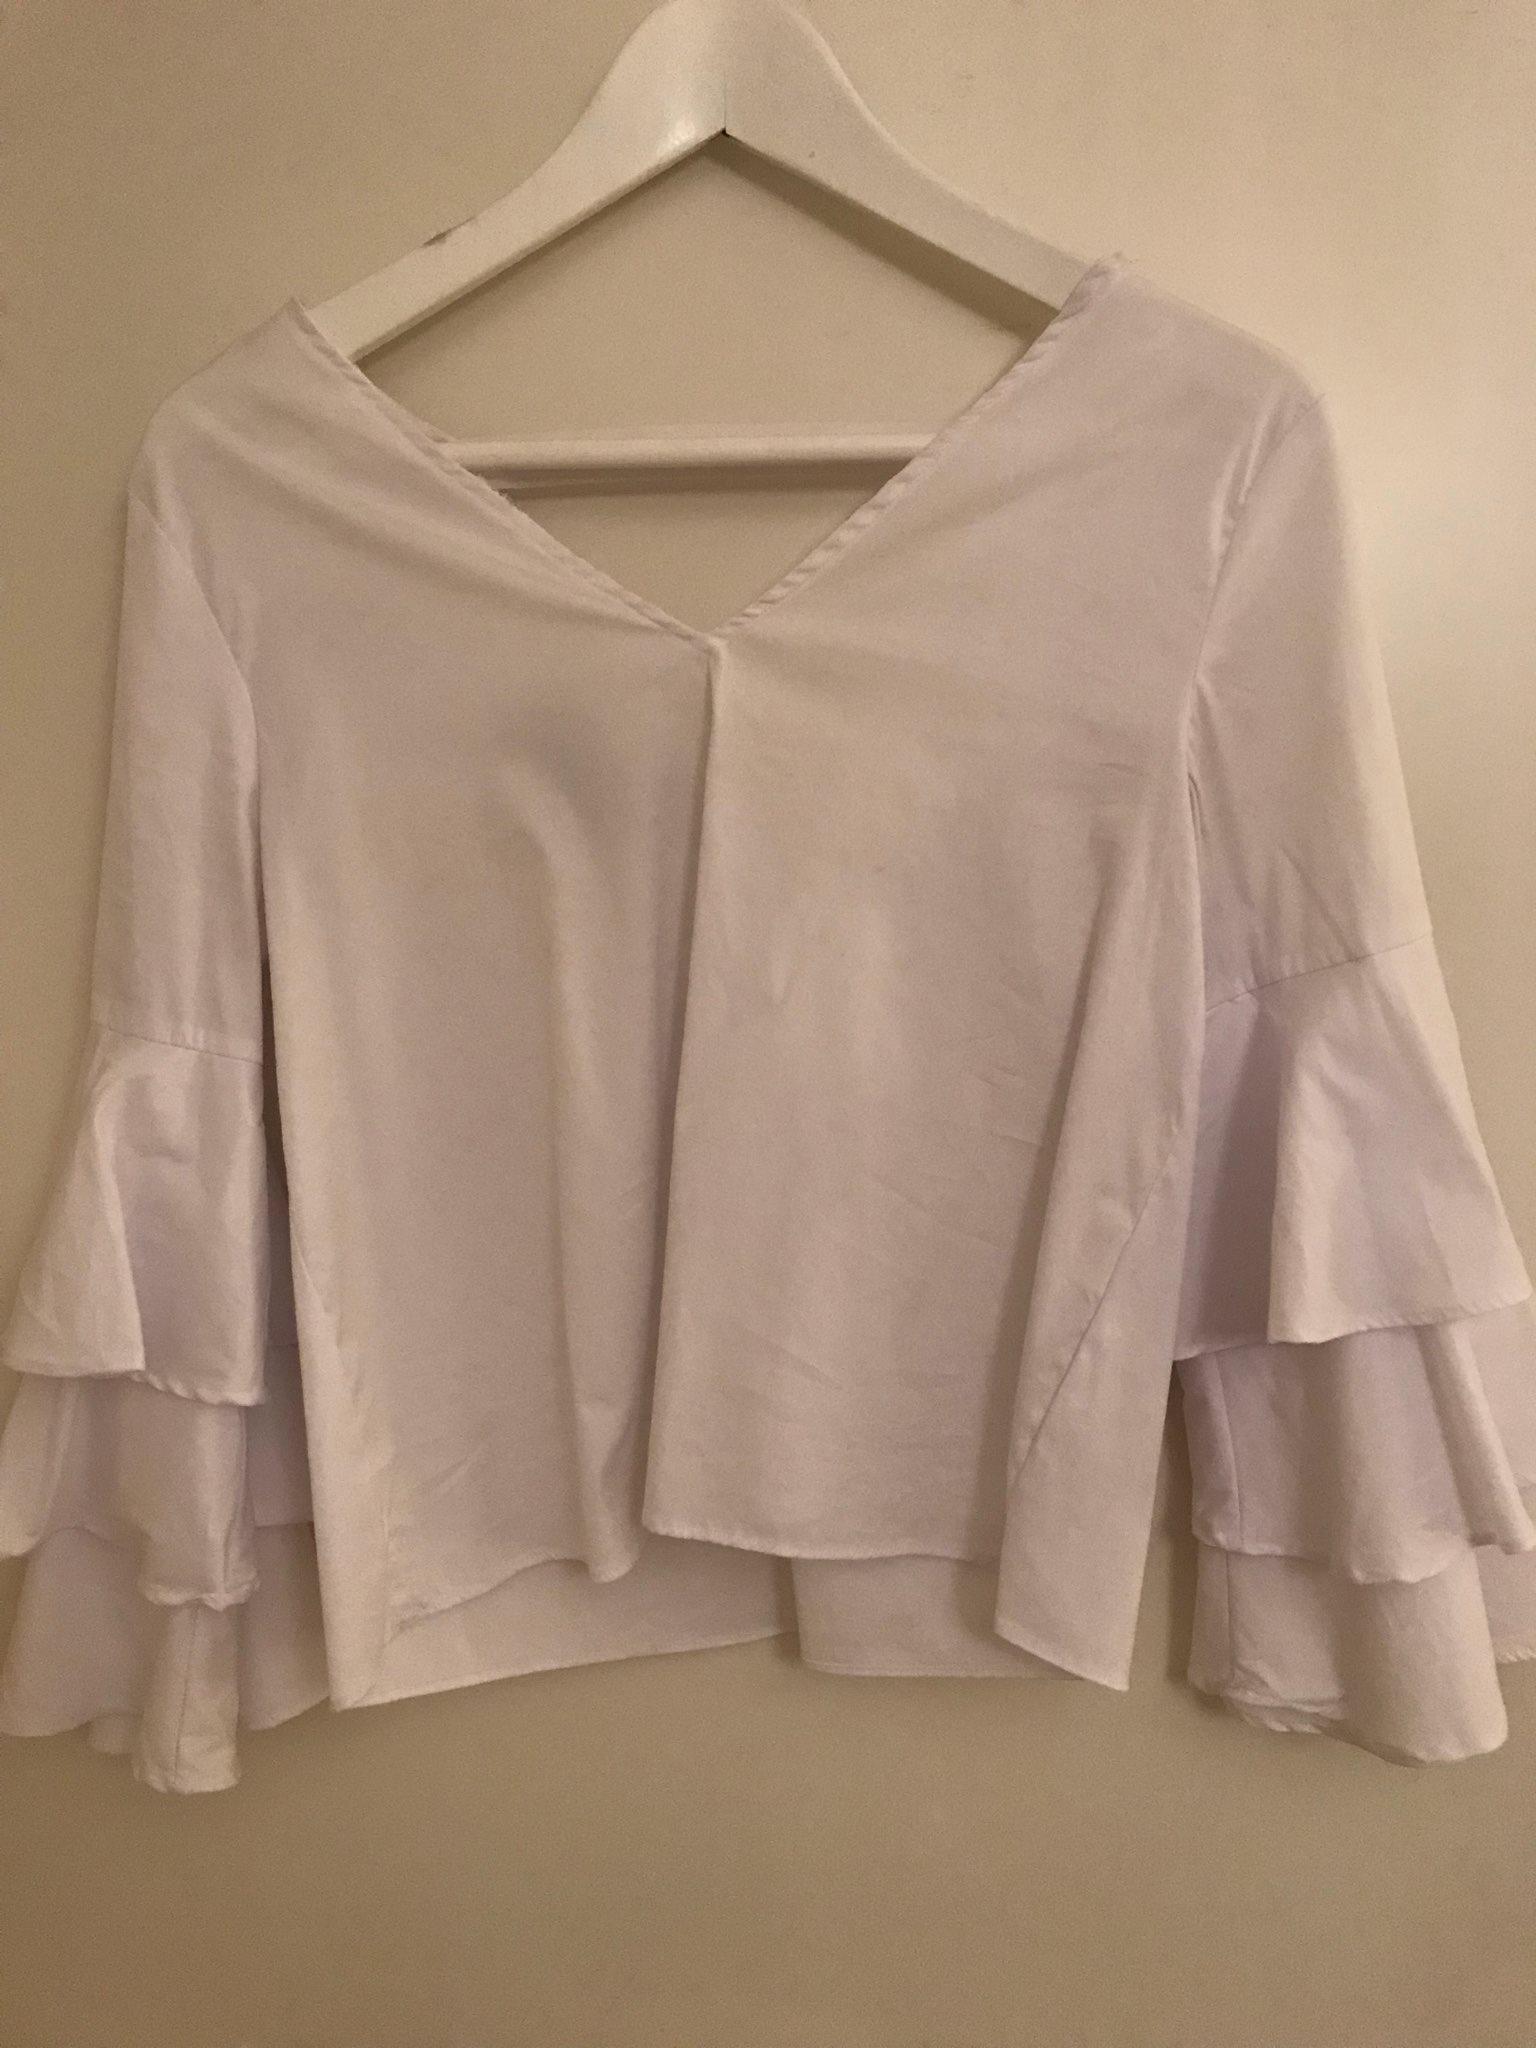 Zara blus top mode trend vit volang (333513648) ᐈ Köp på Tradera f583e18501cf2